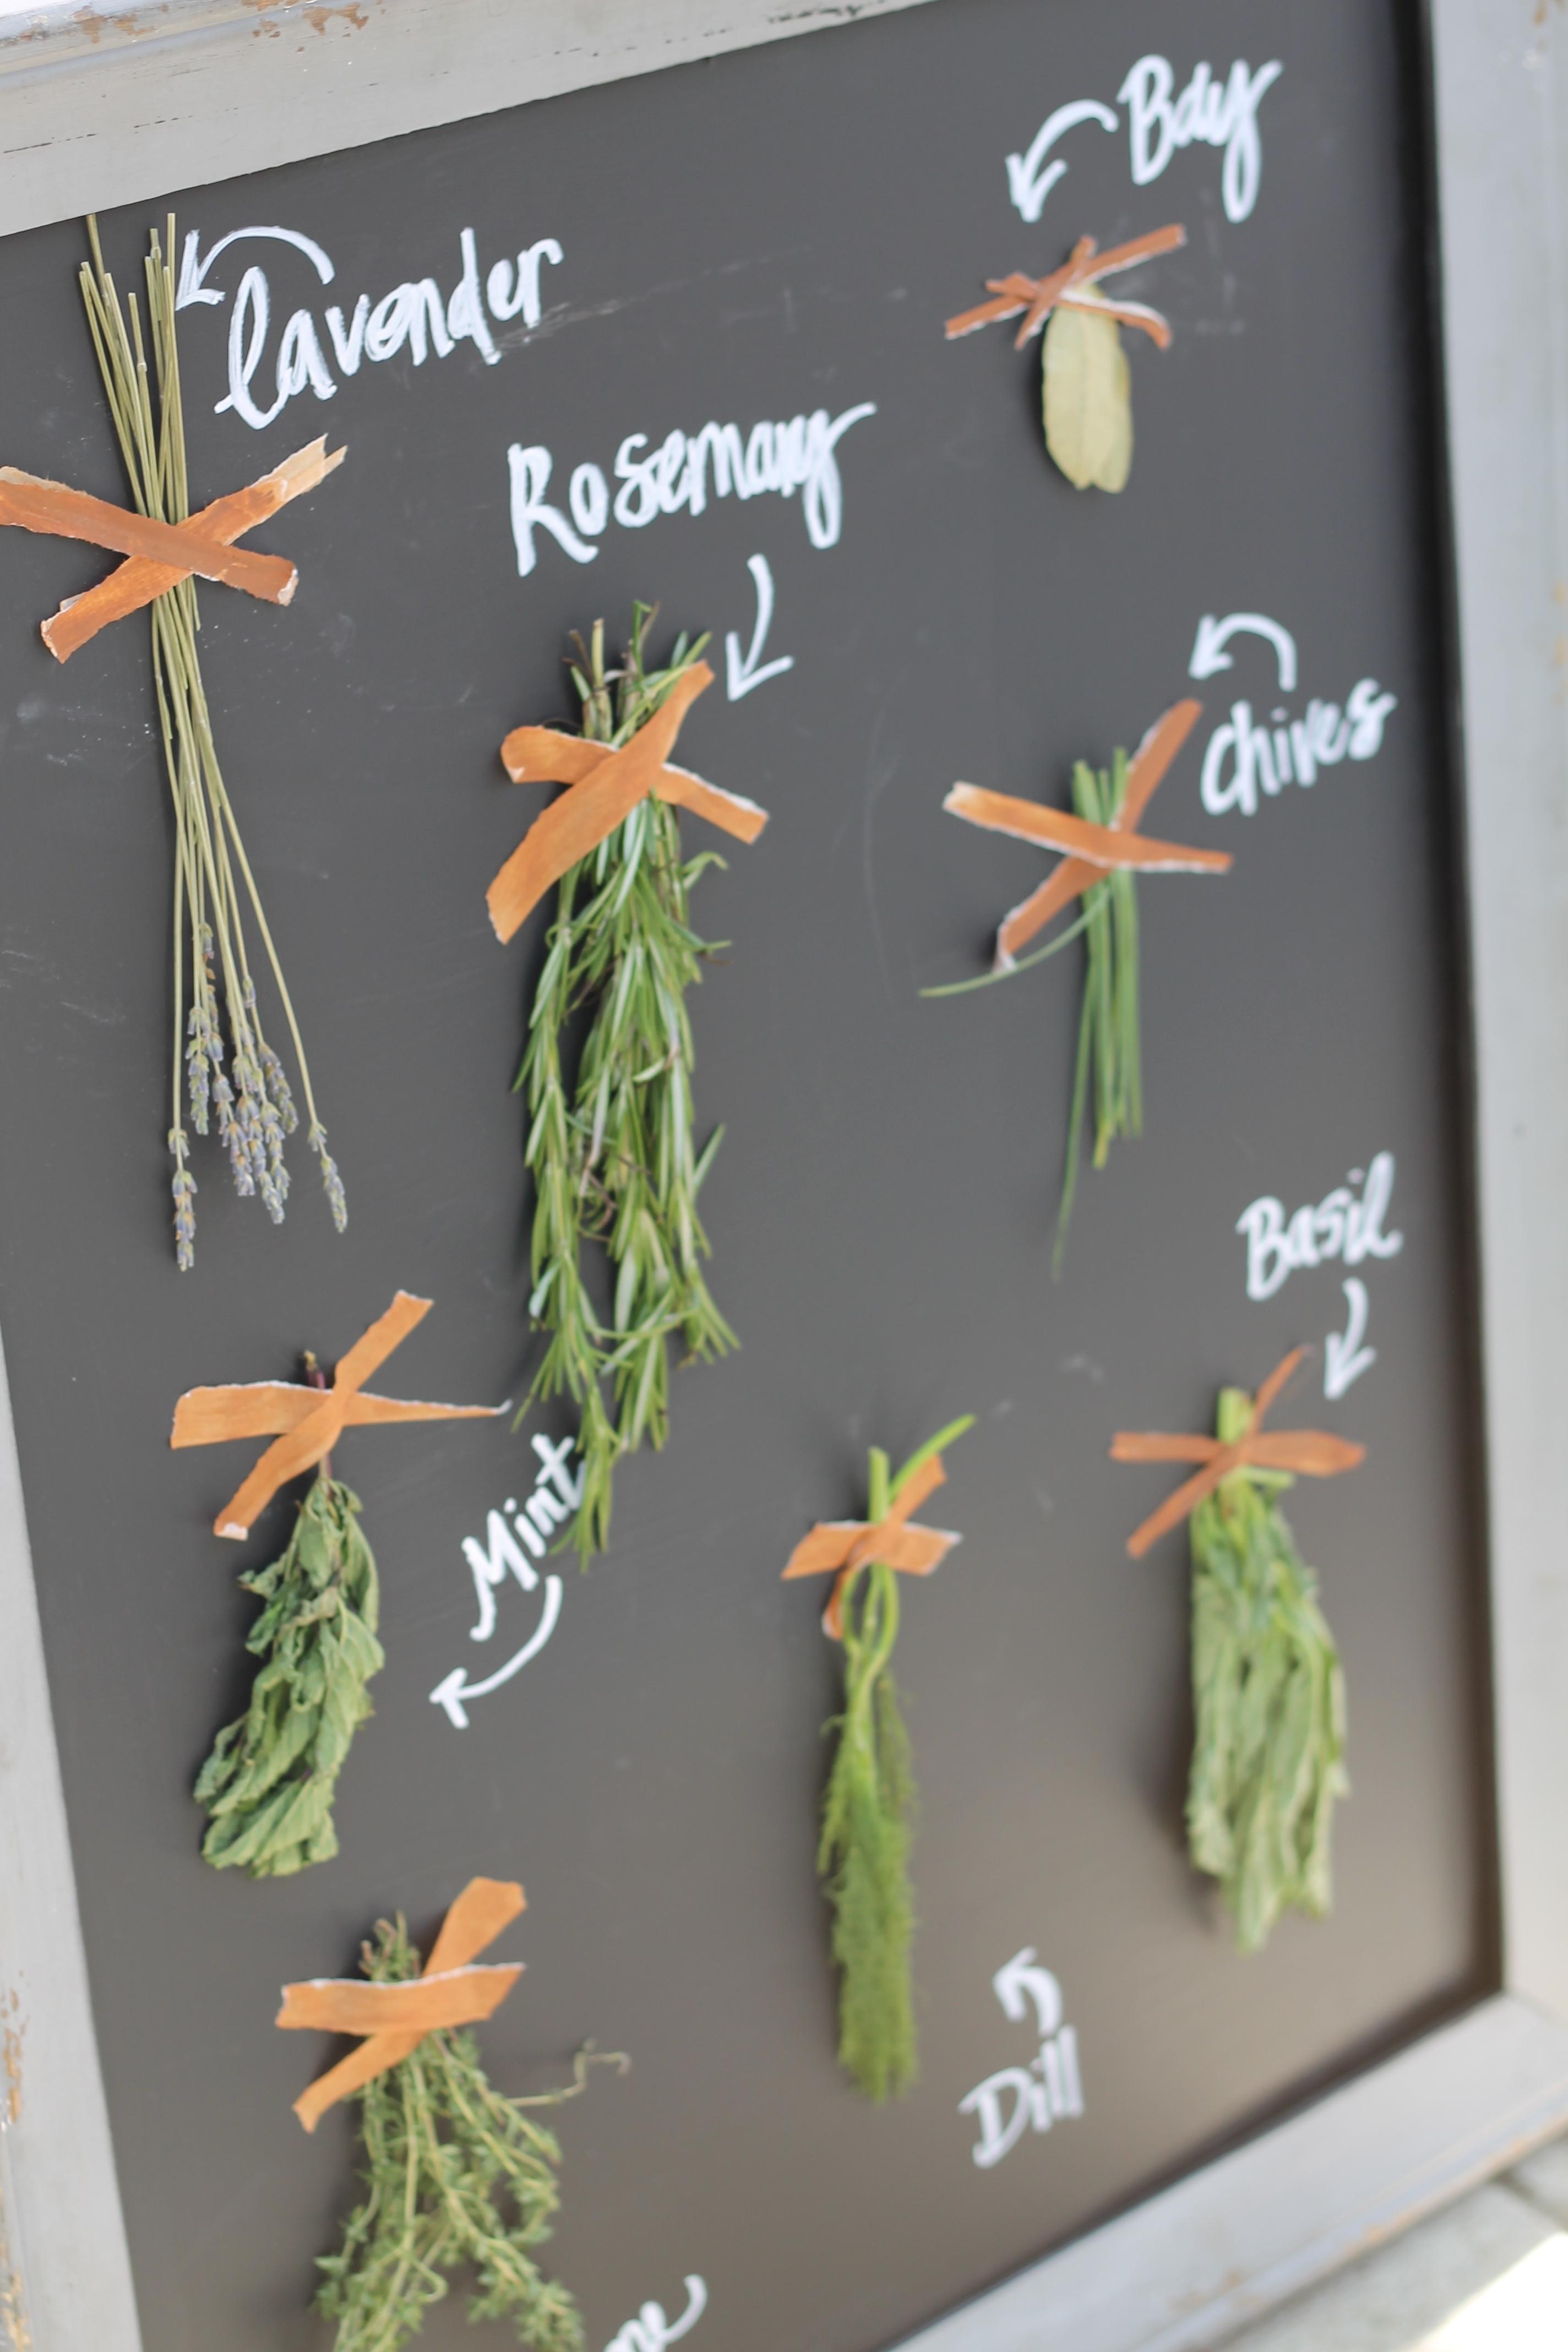 31 Herb Wall Art, Herb Wall Art Etsy – Swinkimorskie With Regard To Recent Herb Wall Art (Gallery 10 of 20)